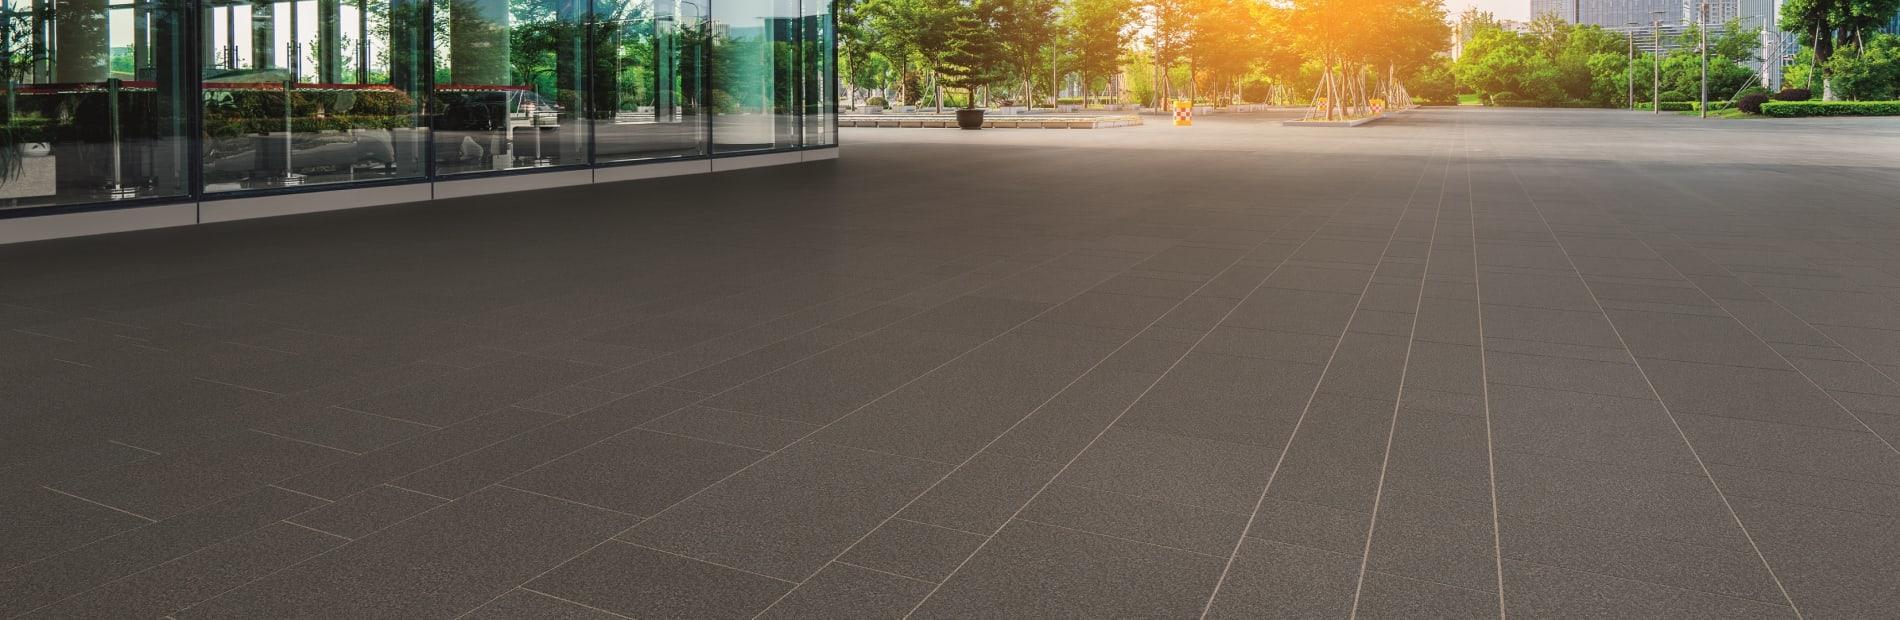 black granite paving outside a building